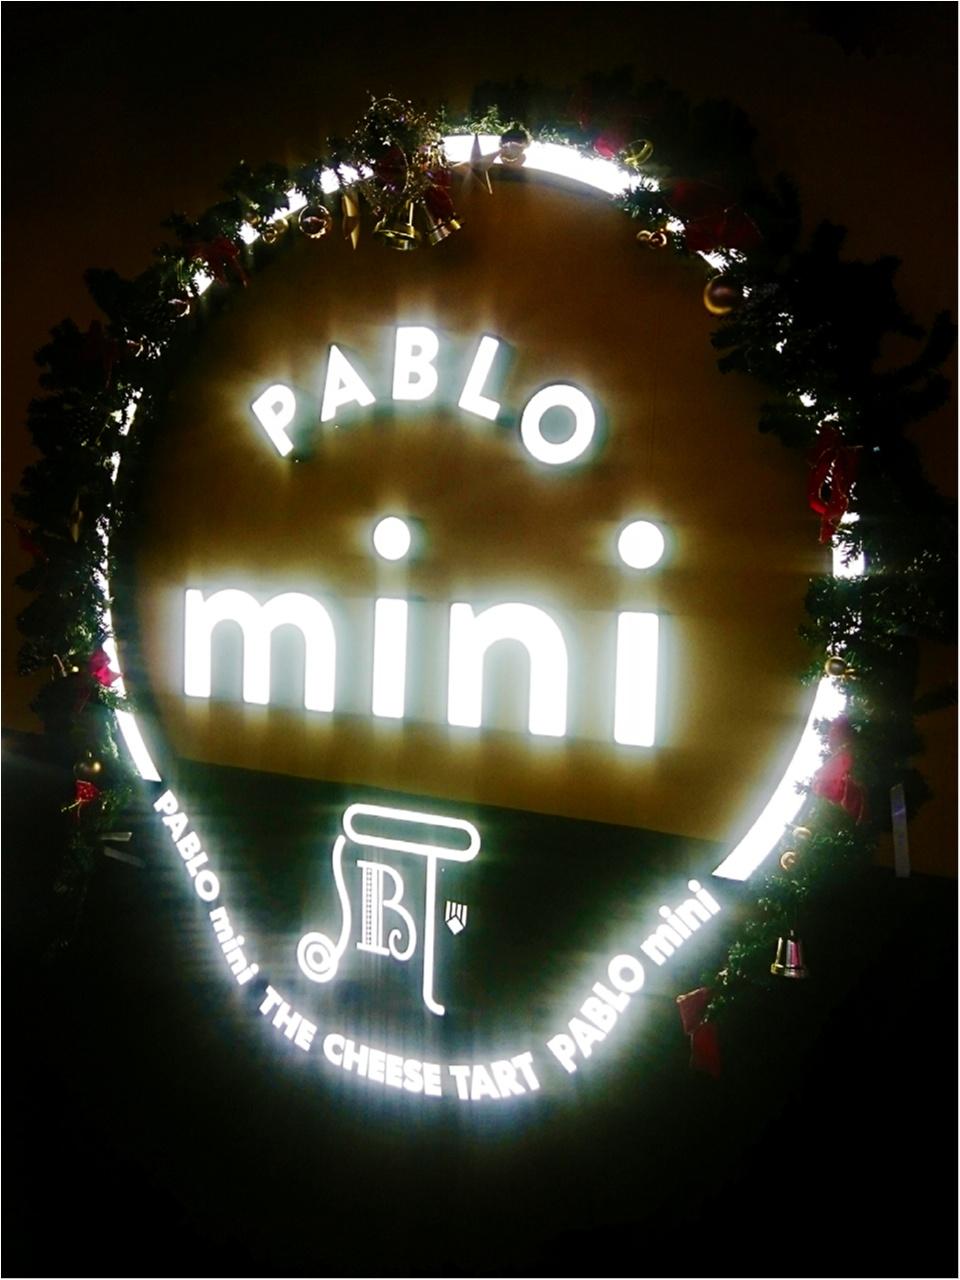 ☆PABLO miniでスタッフ一押しのSpecial Mixを購入☆_1